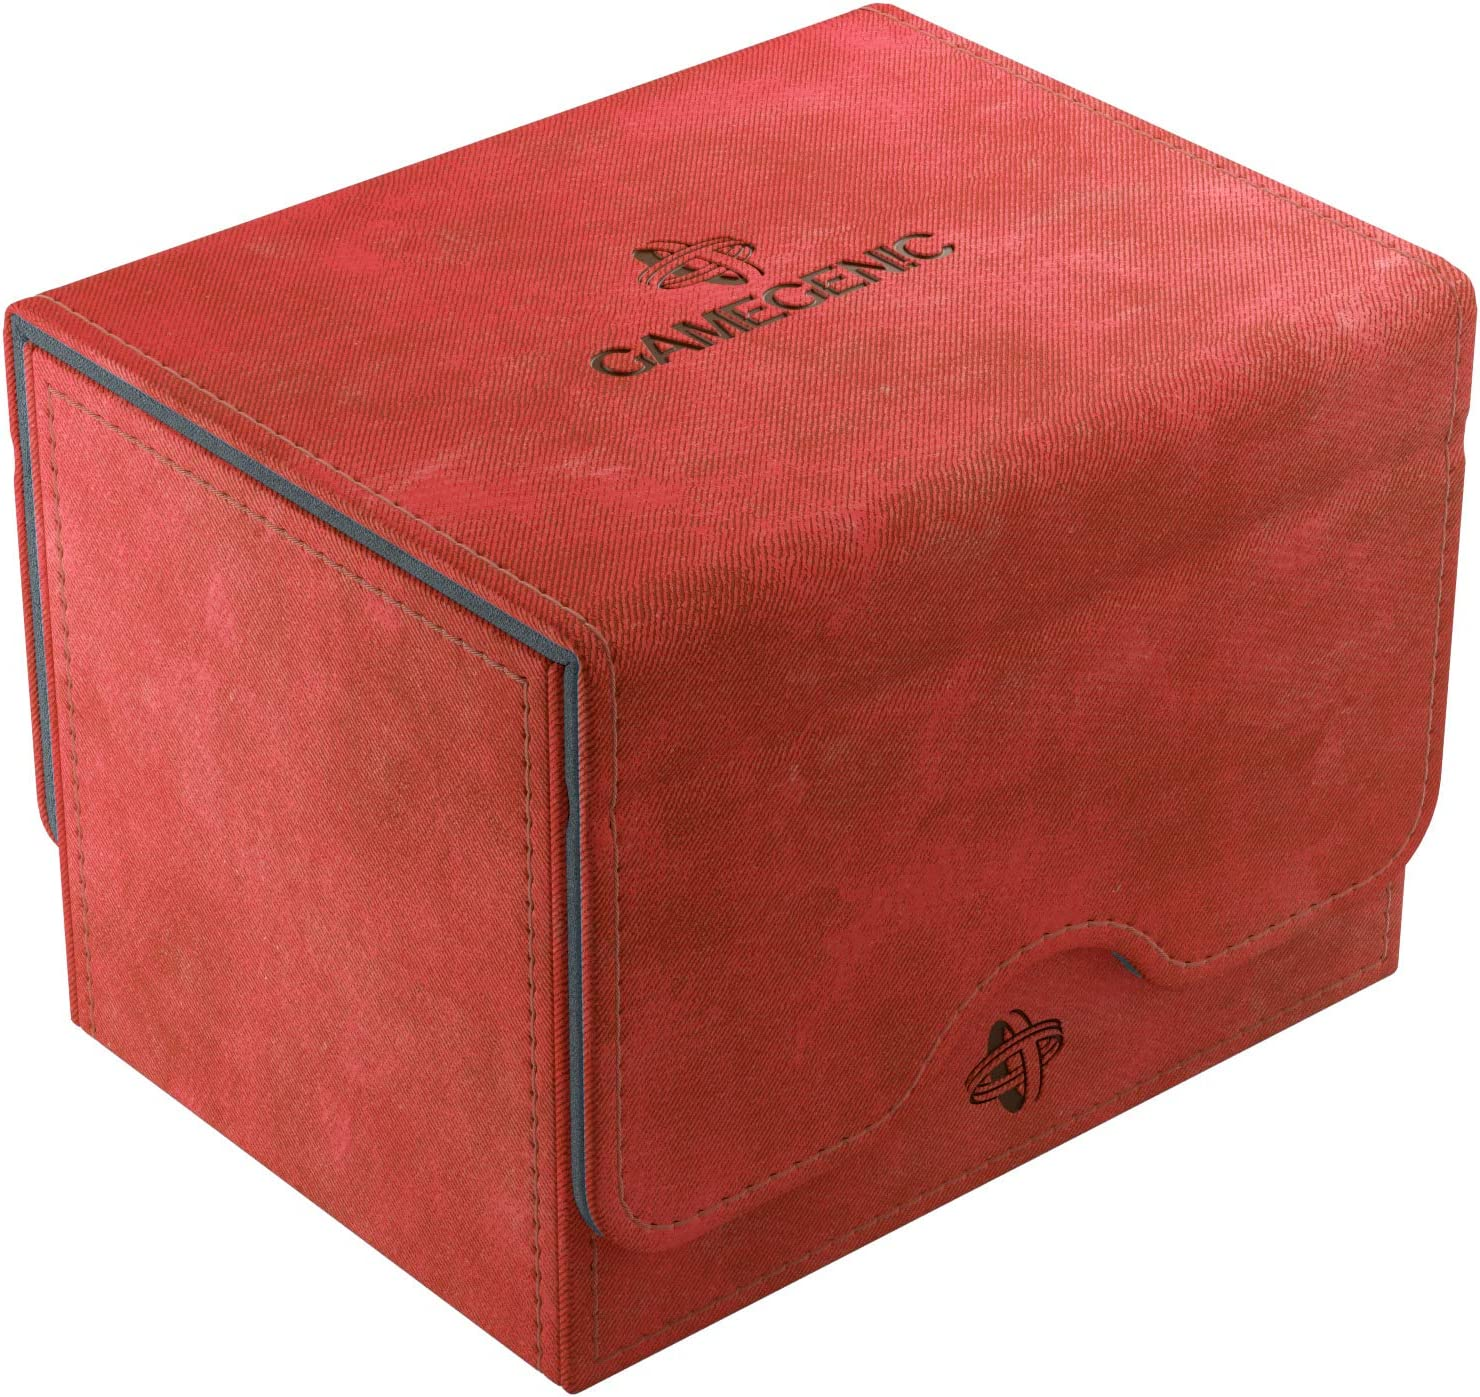 Chicago Mall Gamegenic Deck Box: Sidekick Red 100ct Free shipping Convertible